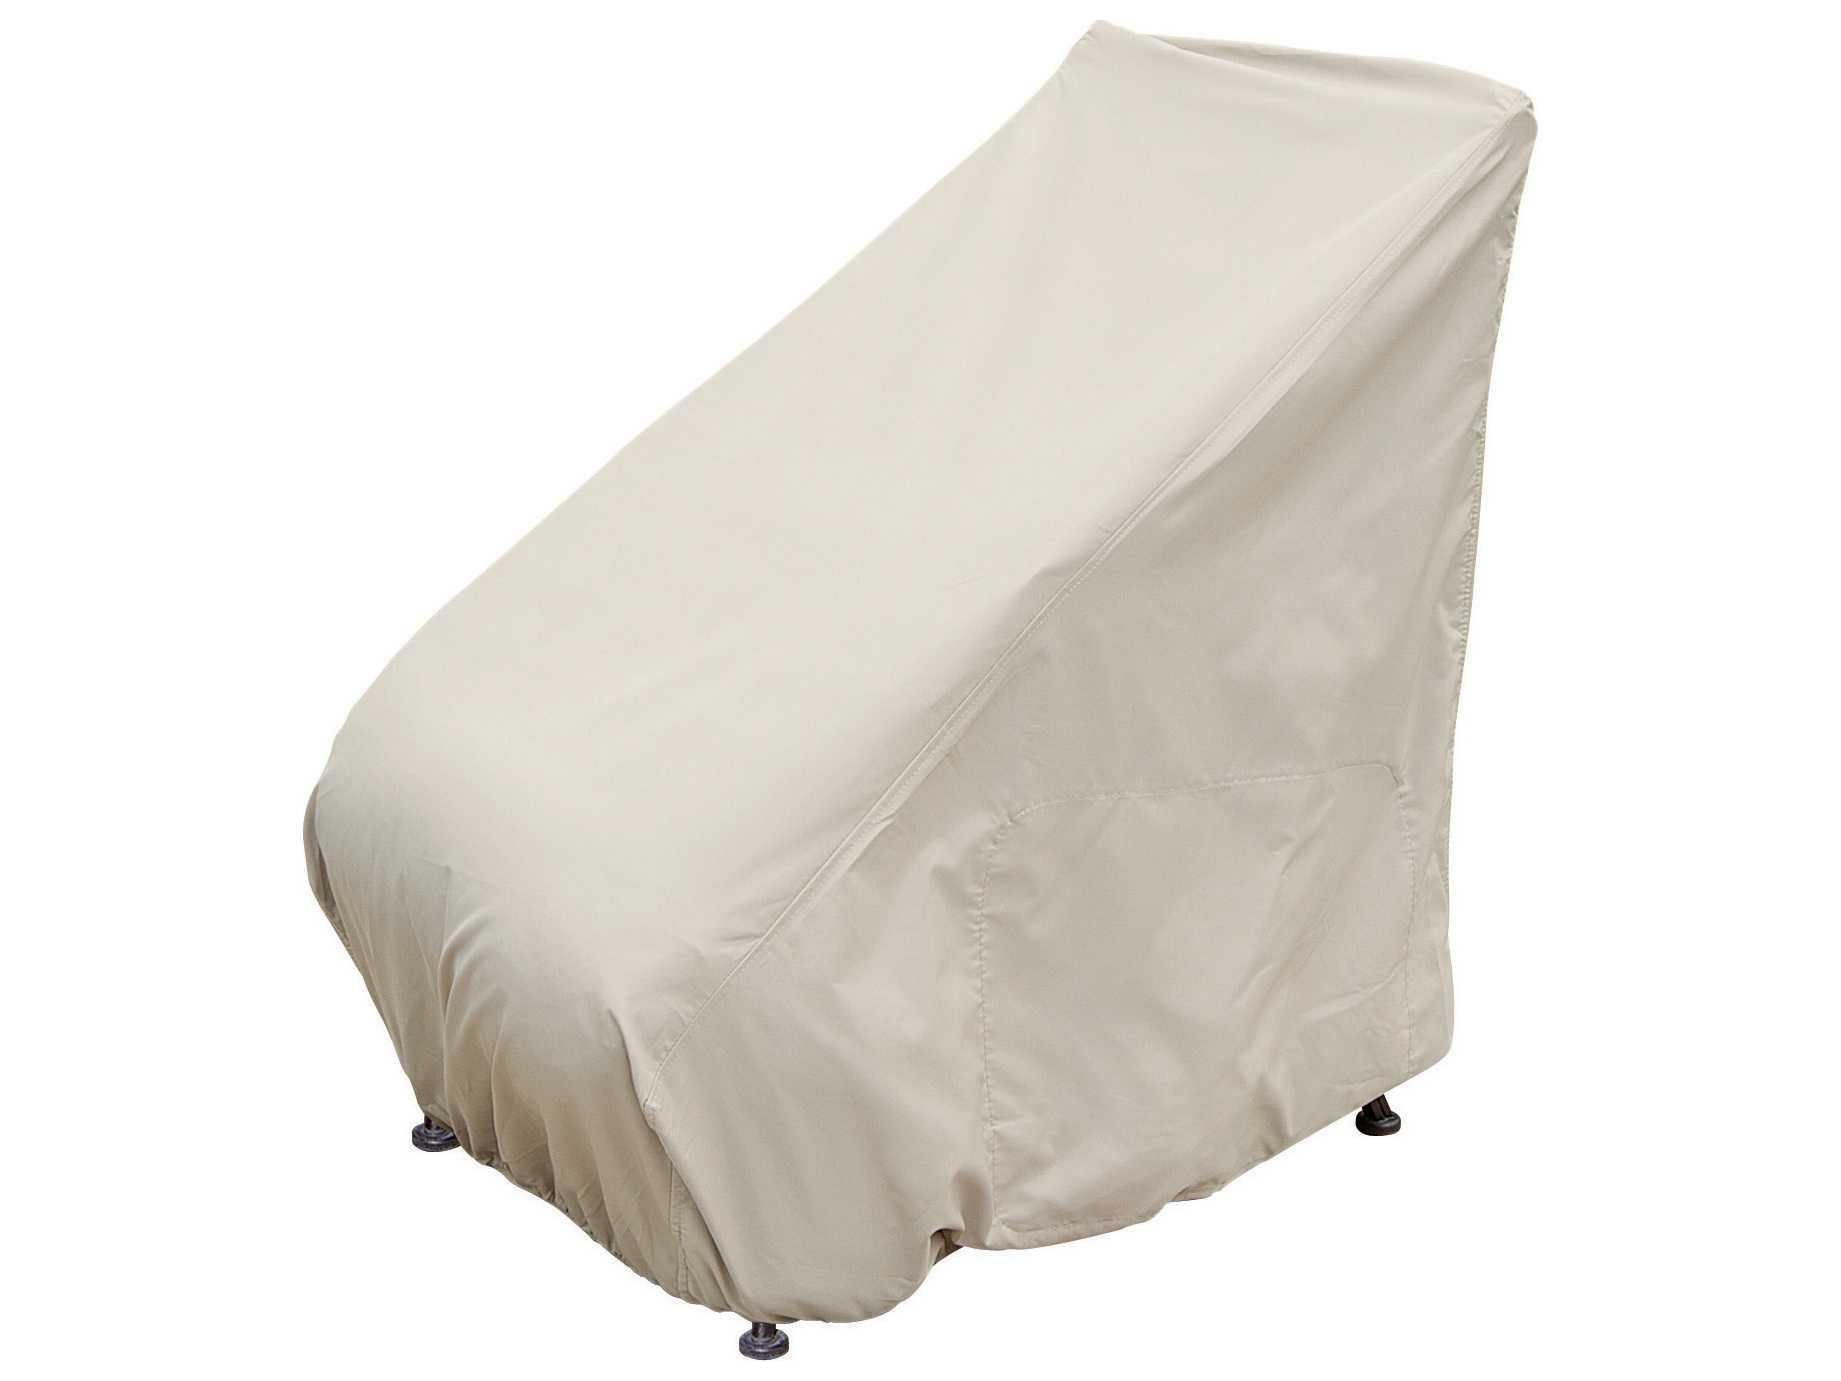 spotlight outdoor chair covers aeron herman miller review treasure garden recliner cover cp113